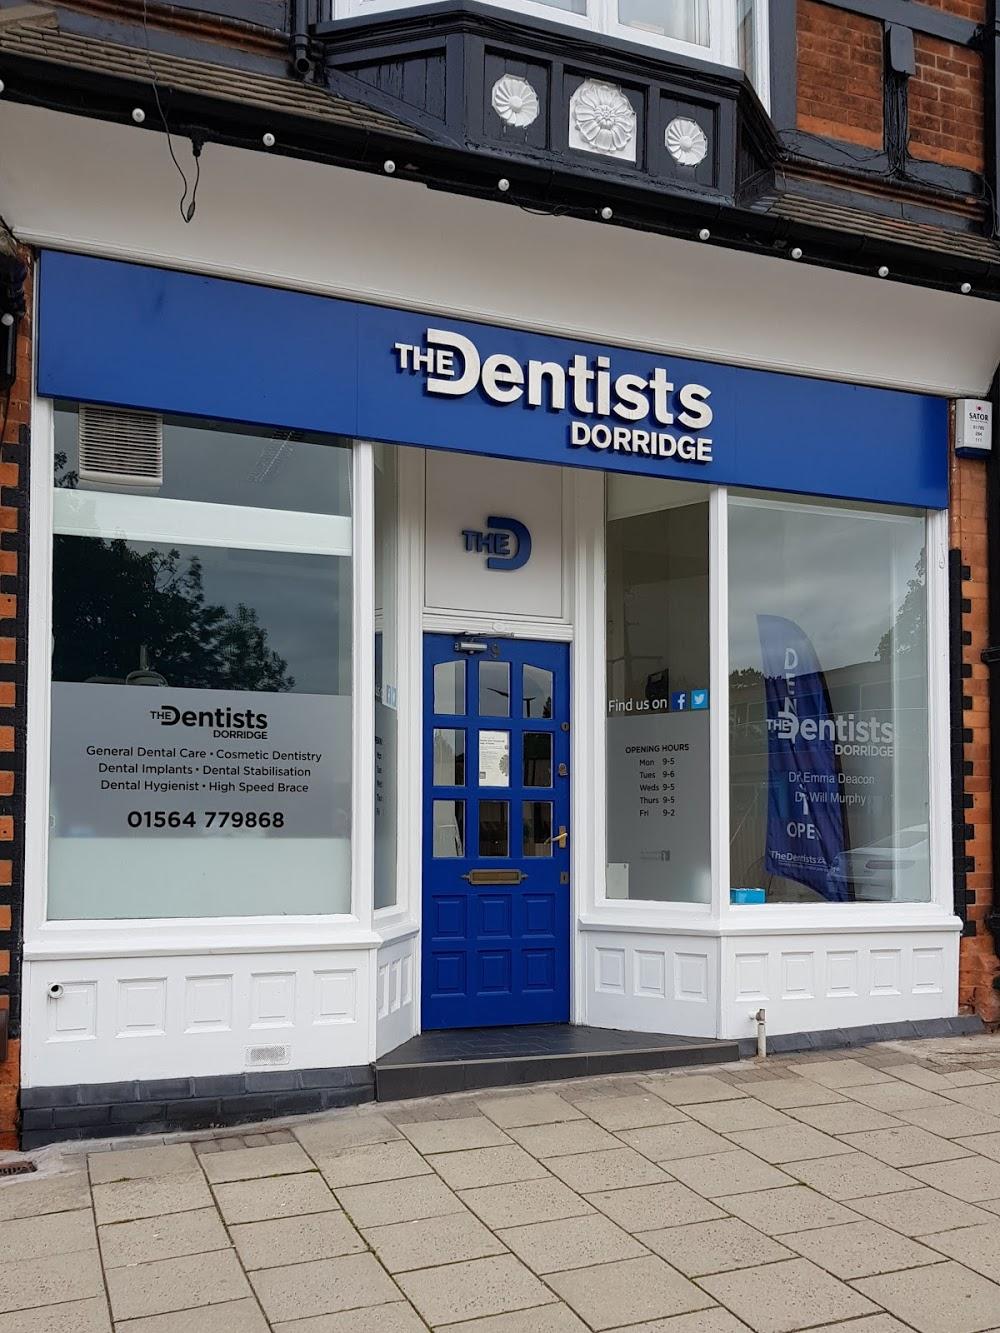 The Dentists Dorridge